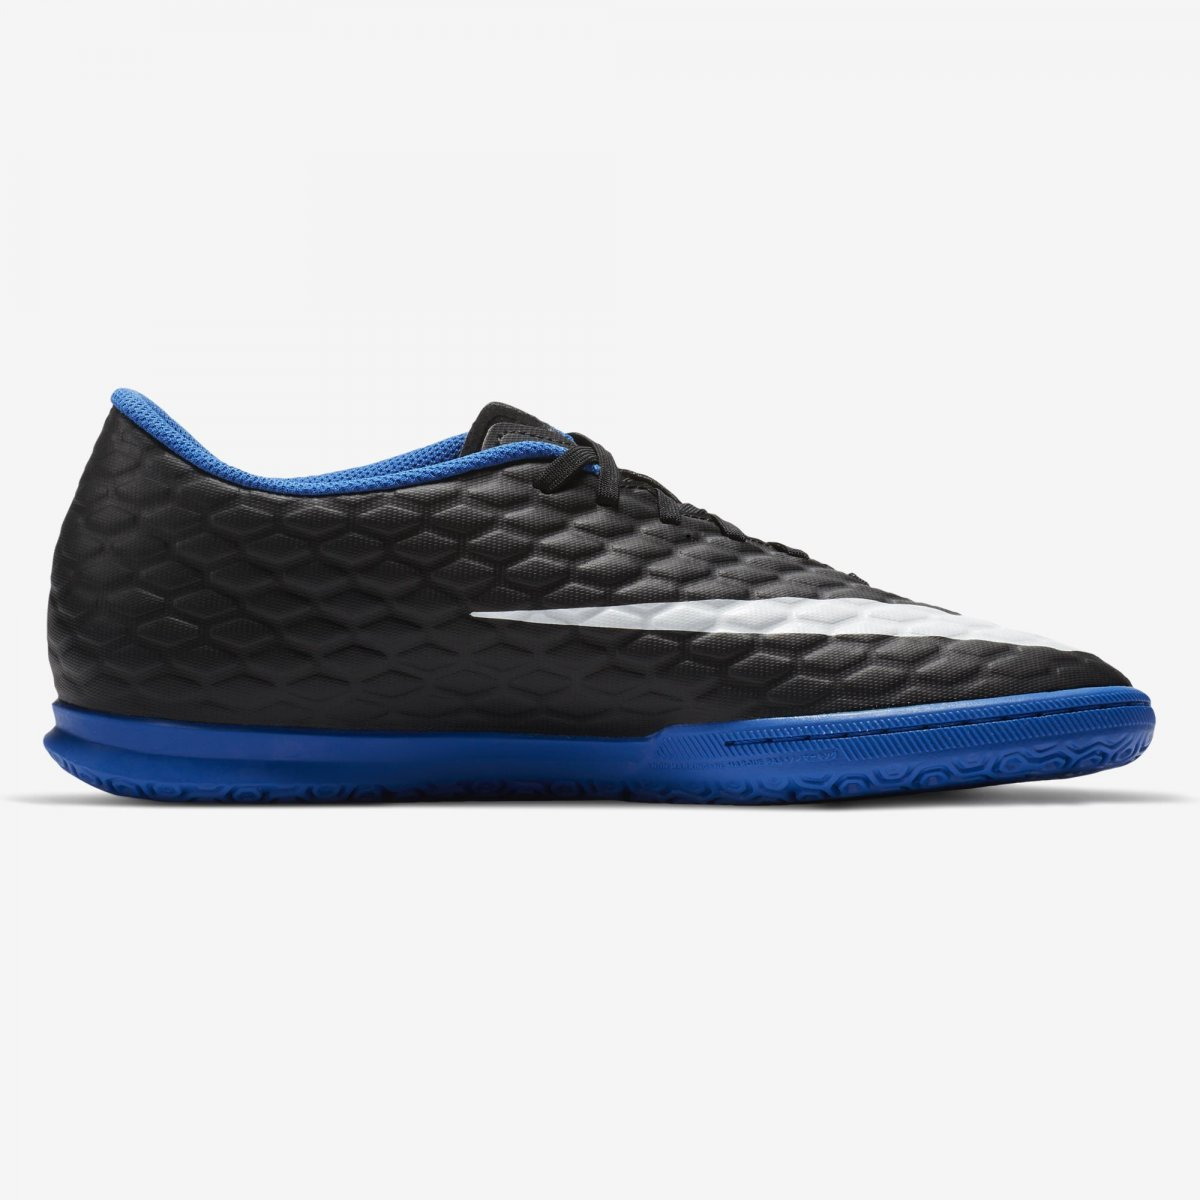 fa0f8ee064e96 Bizz Store - Chuteira Masculina Futsal Nike Hypervenomx Phade III